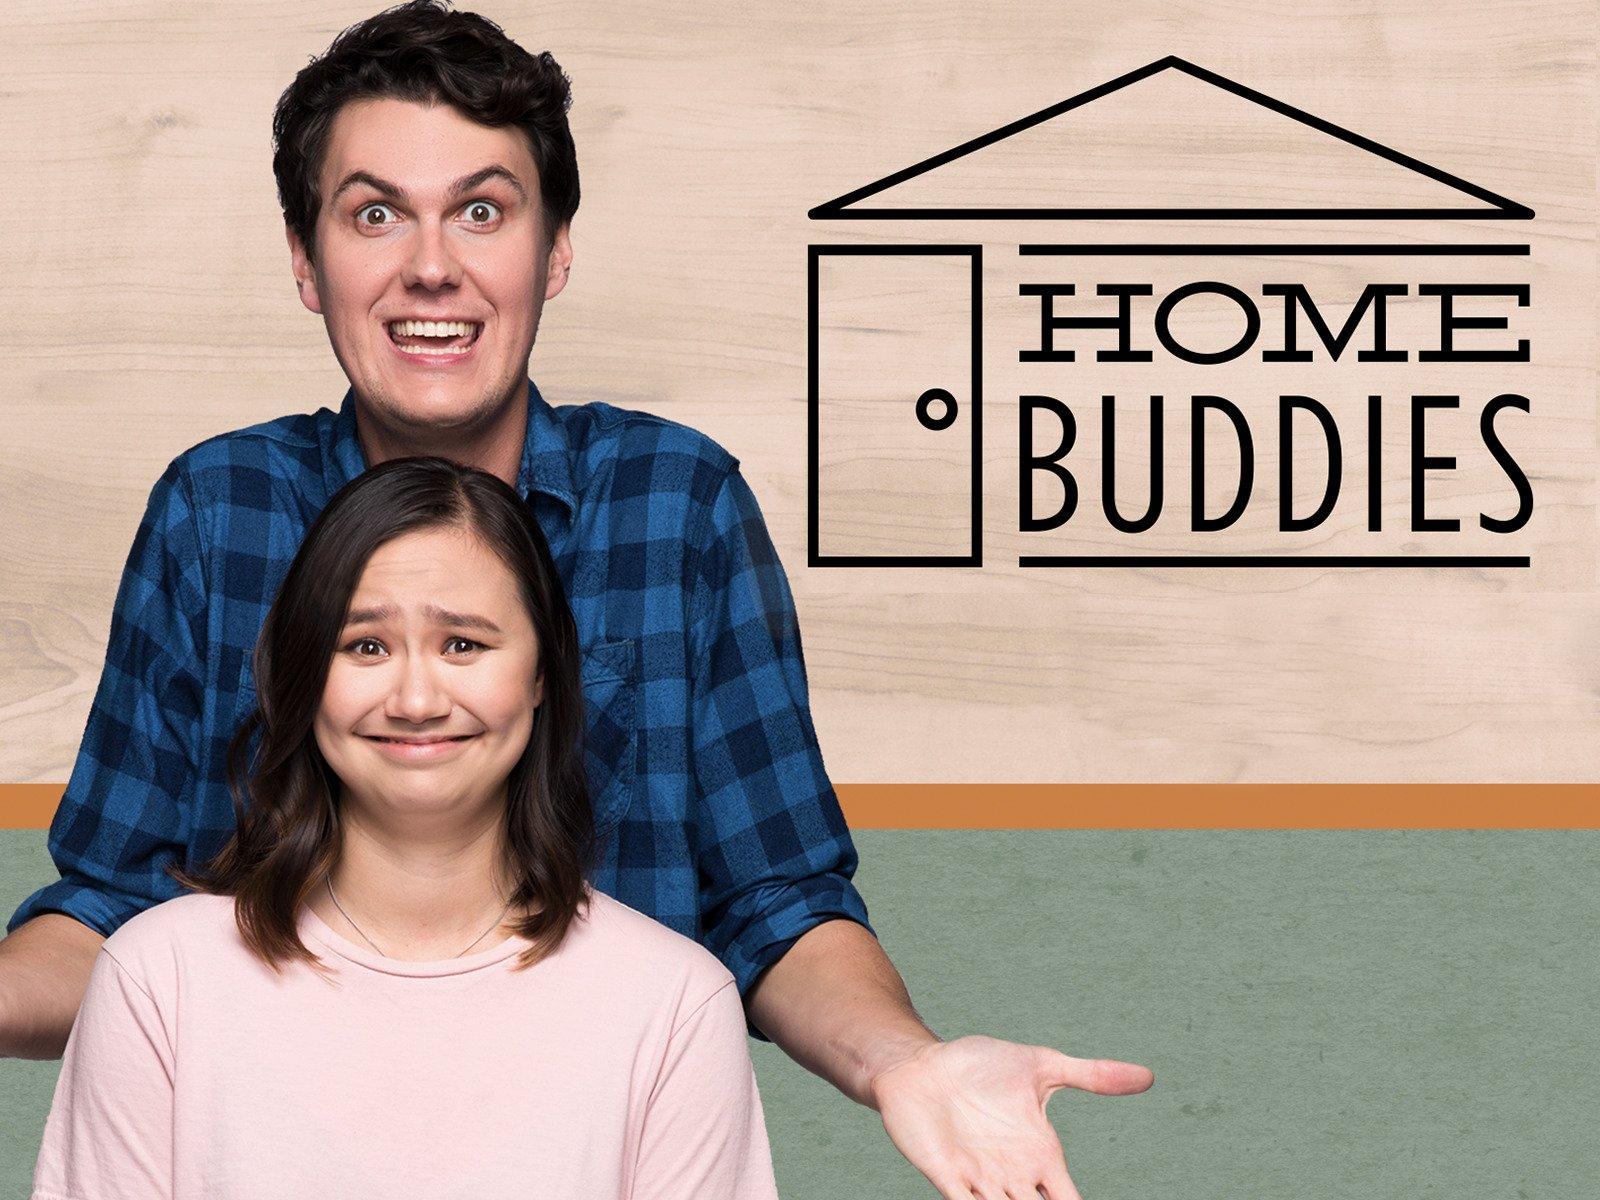 Homebuddies on Amazon Prime Video UK